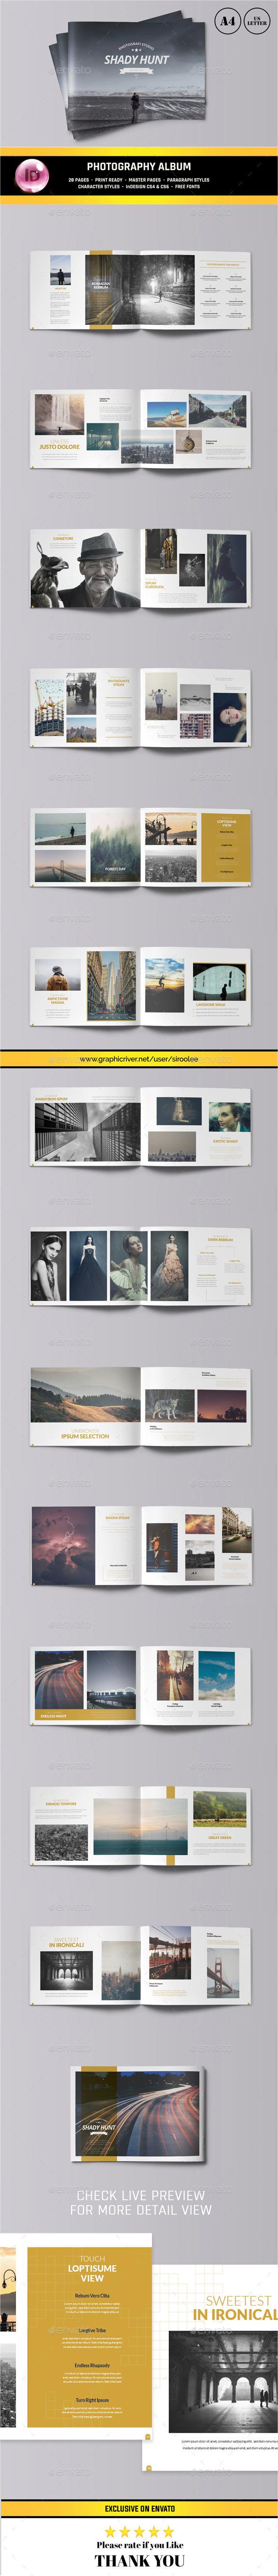 Photography Portfolio Album - Photo Albums Print Templates